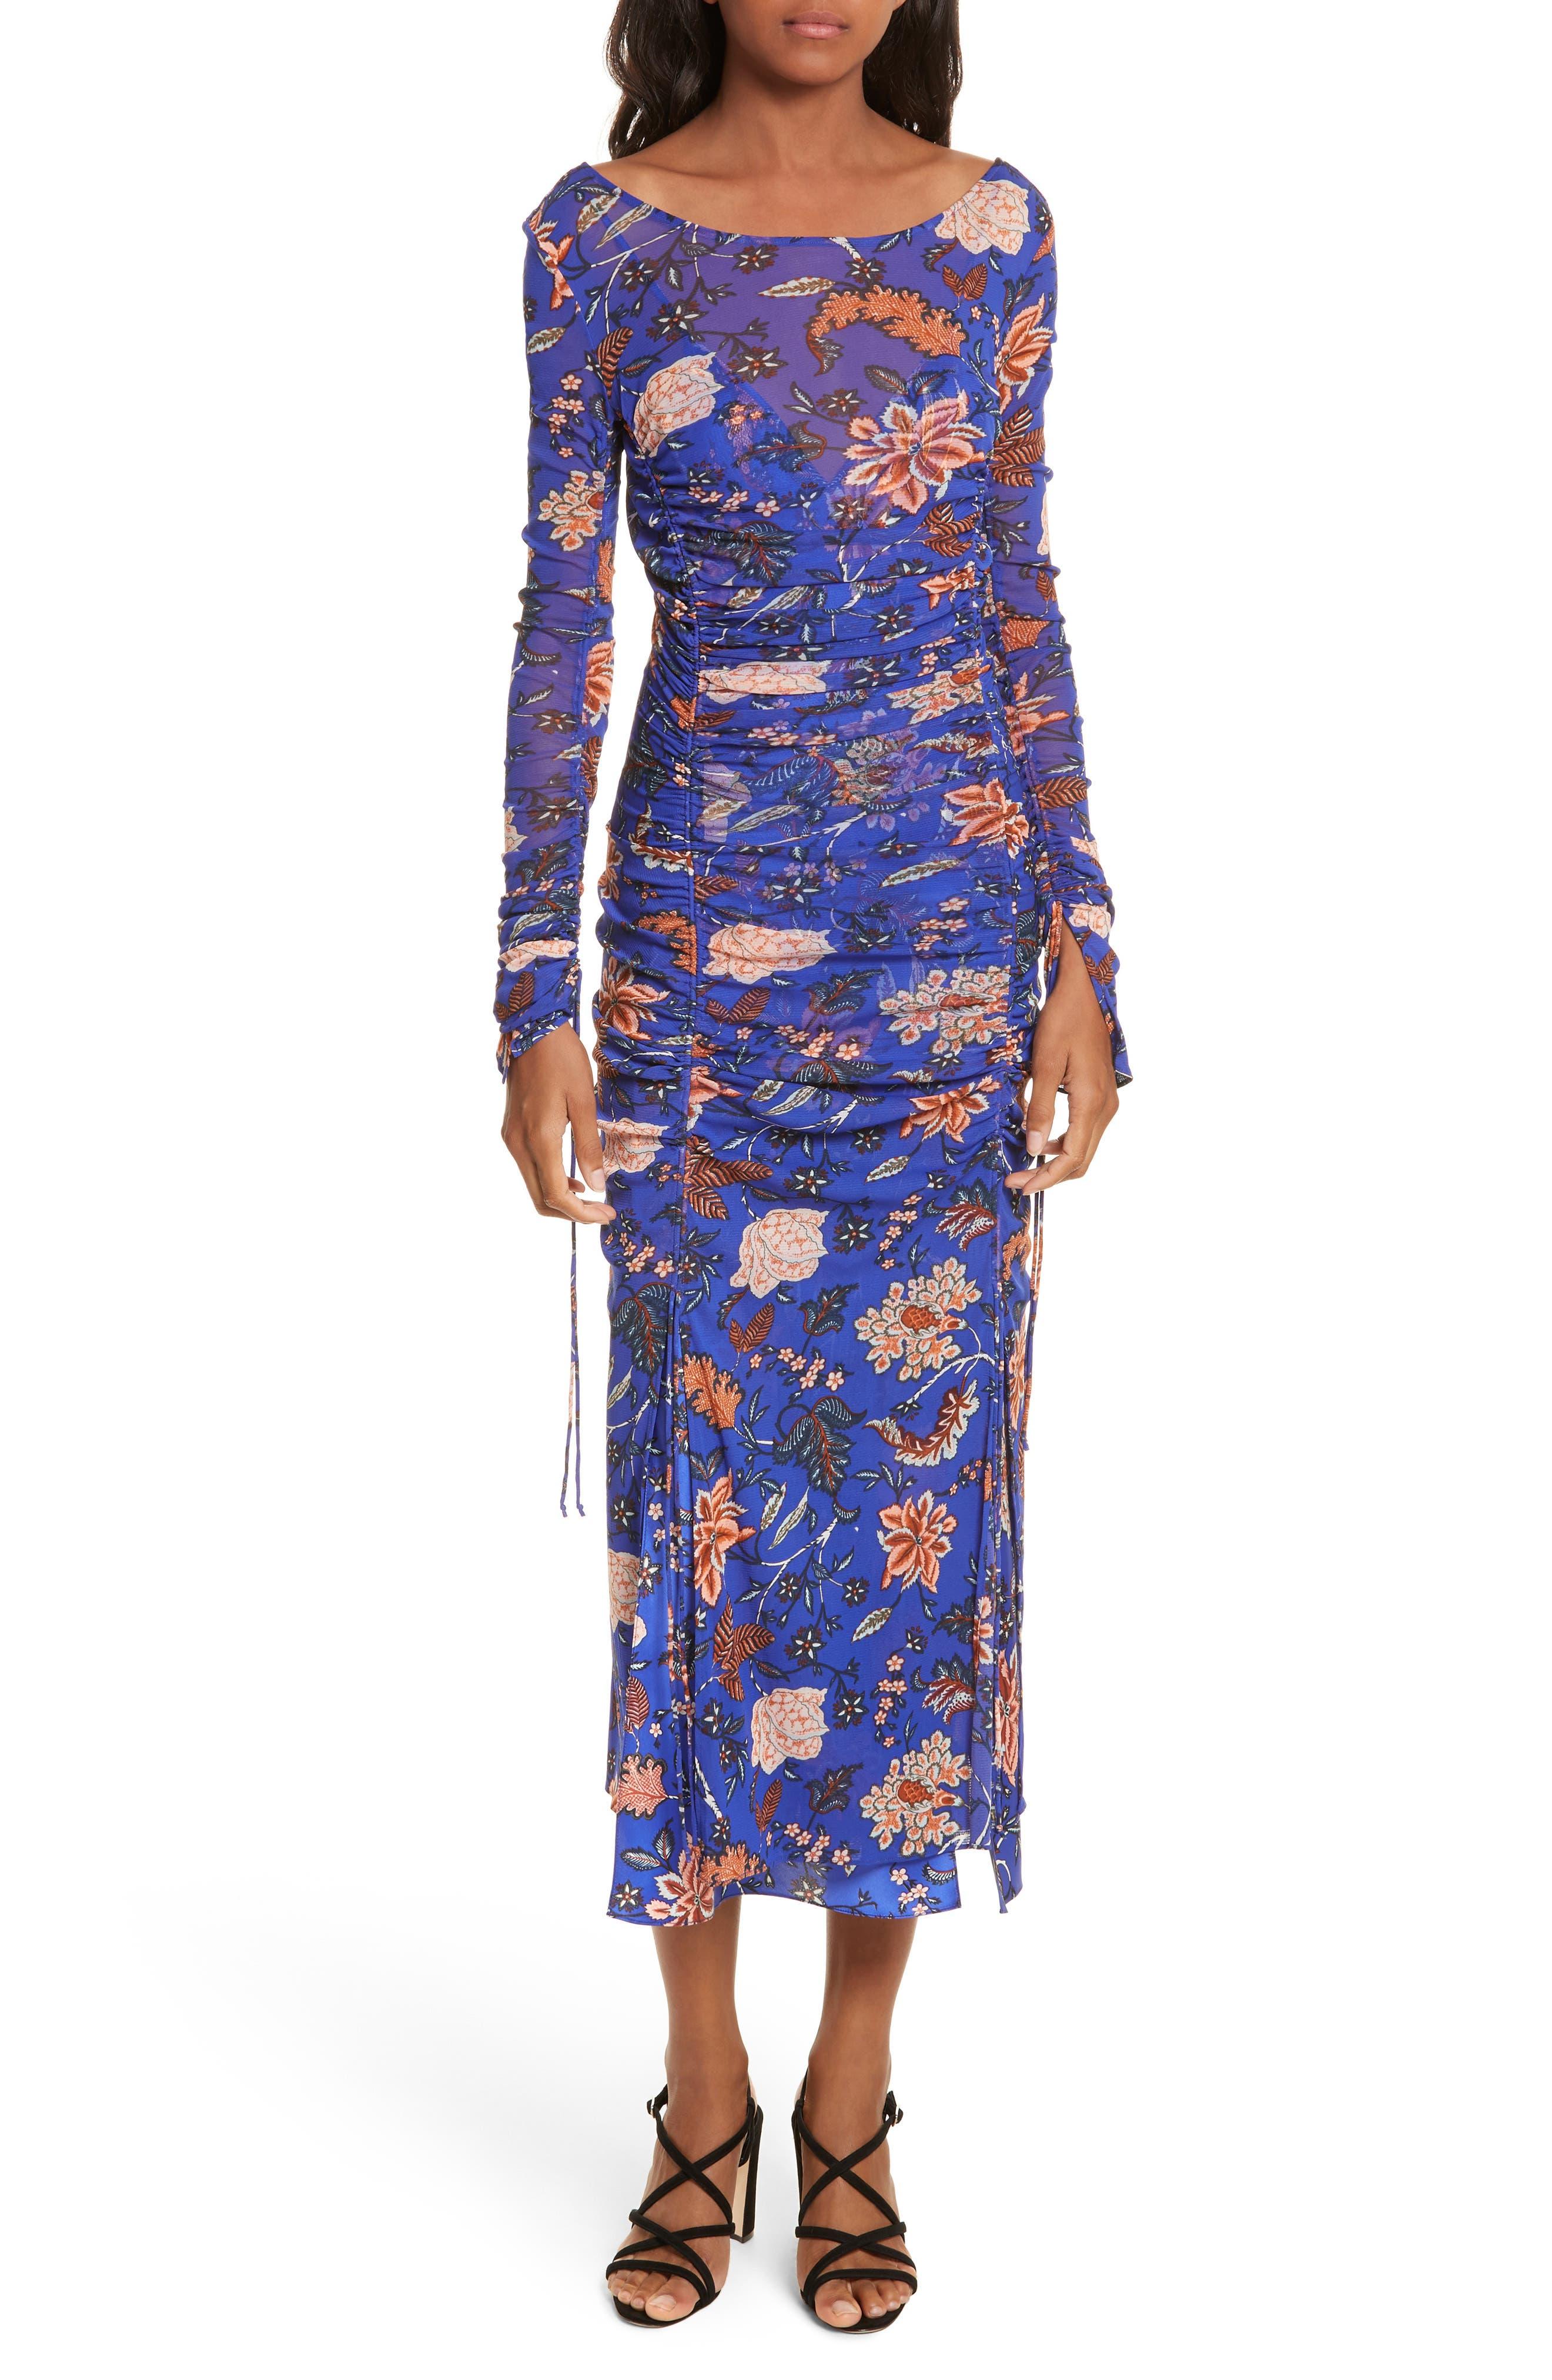 Diane von Furstenberg Mesh Overlay Floral Midi Dress,                             Main thumbnail 1, color,                             533